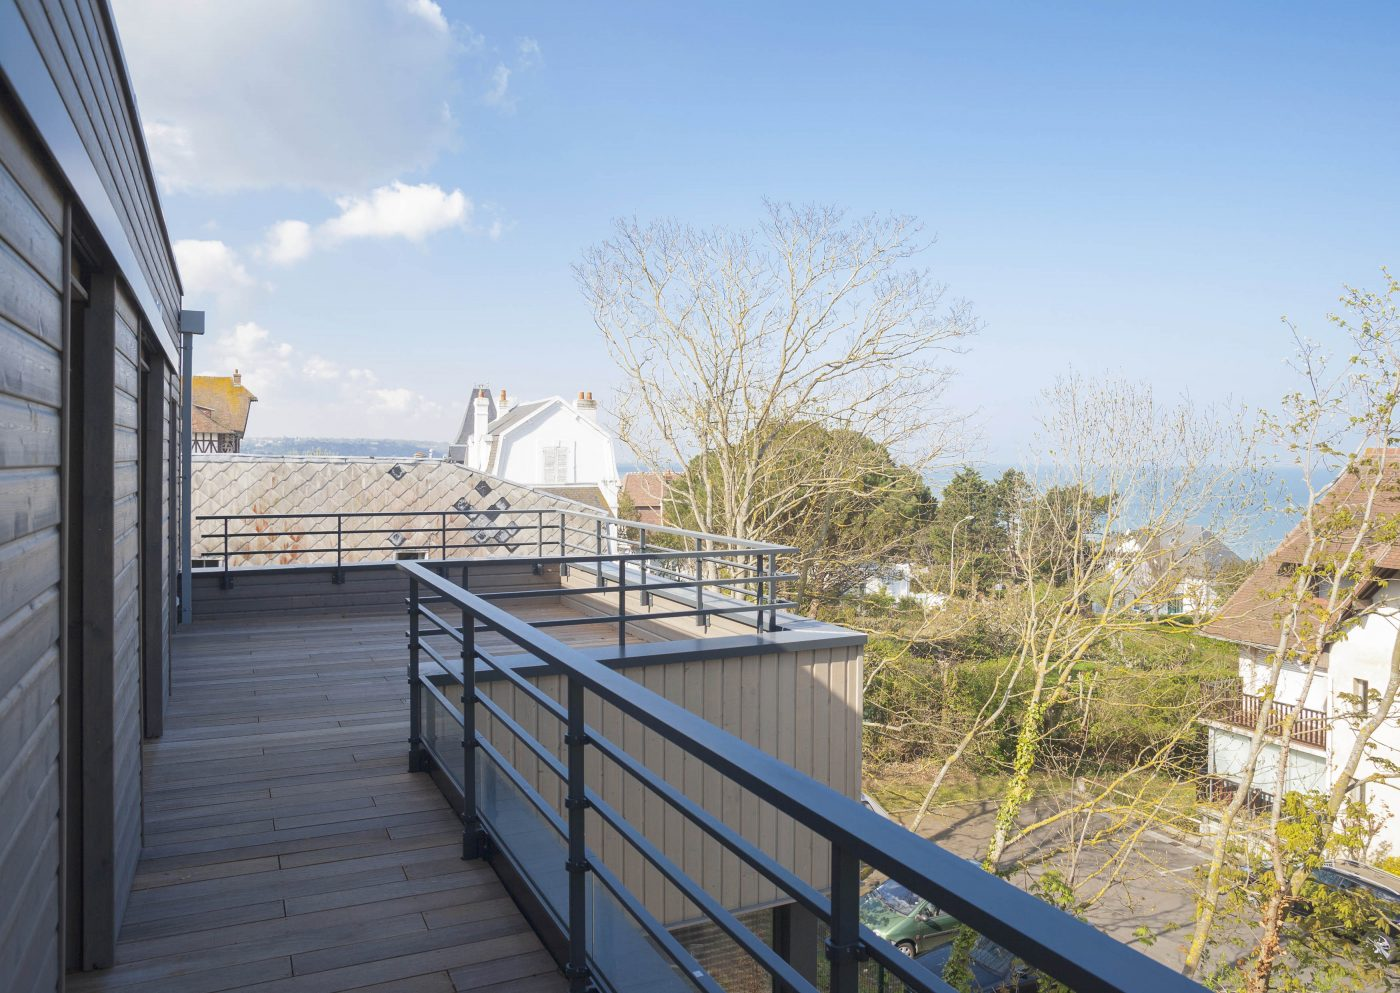 Philippe_Zerbib_Architecte_construction_maisons_ossature_bois_projet_maison_benhamou_MG_8468